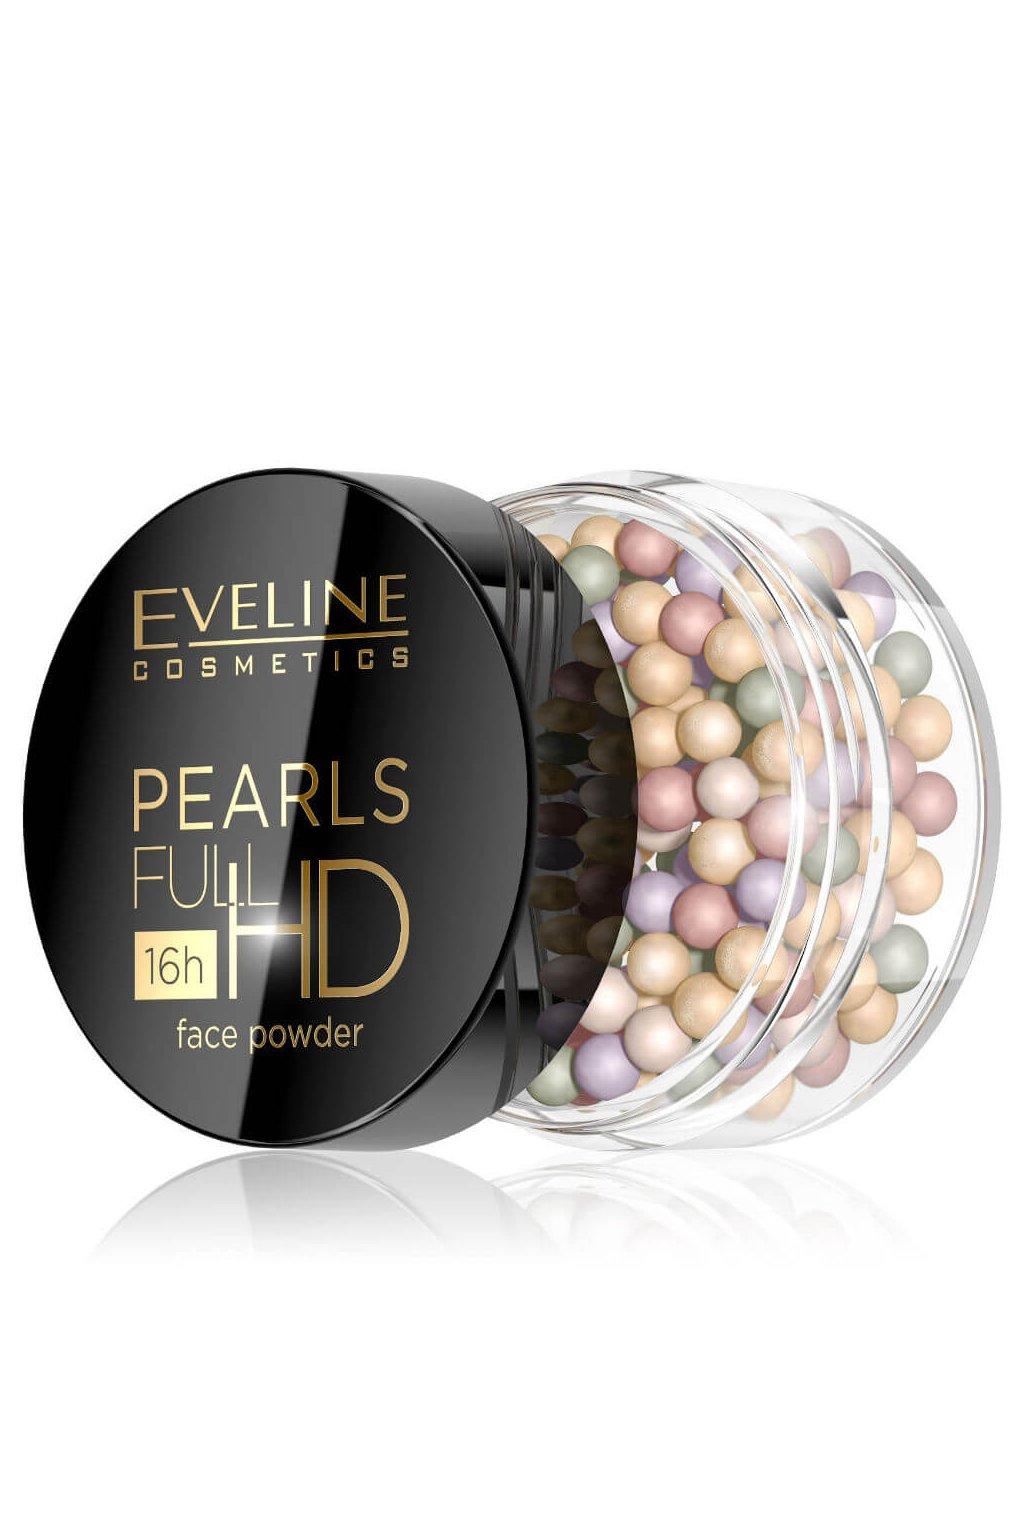 eveline cosmetics full hd pearls barevny pudr cc 20g